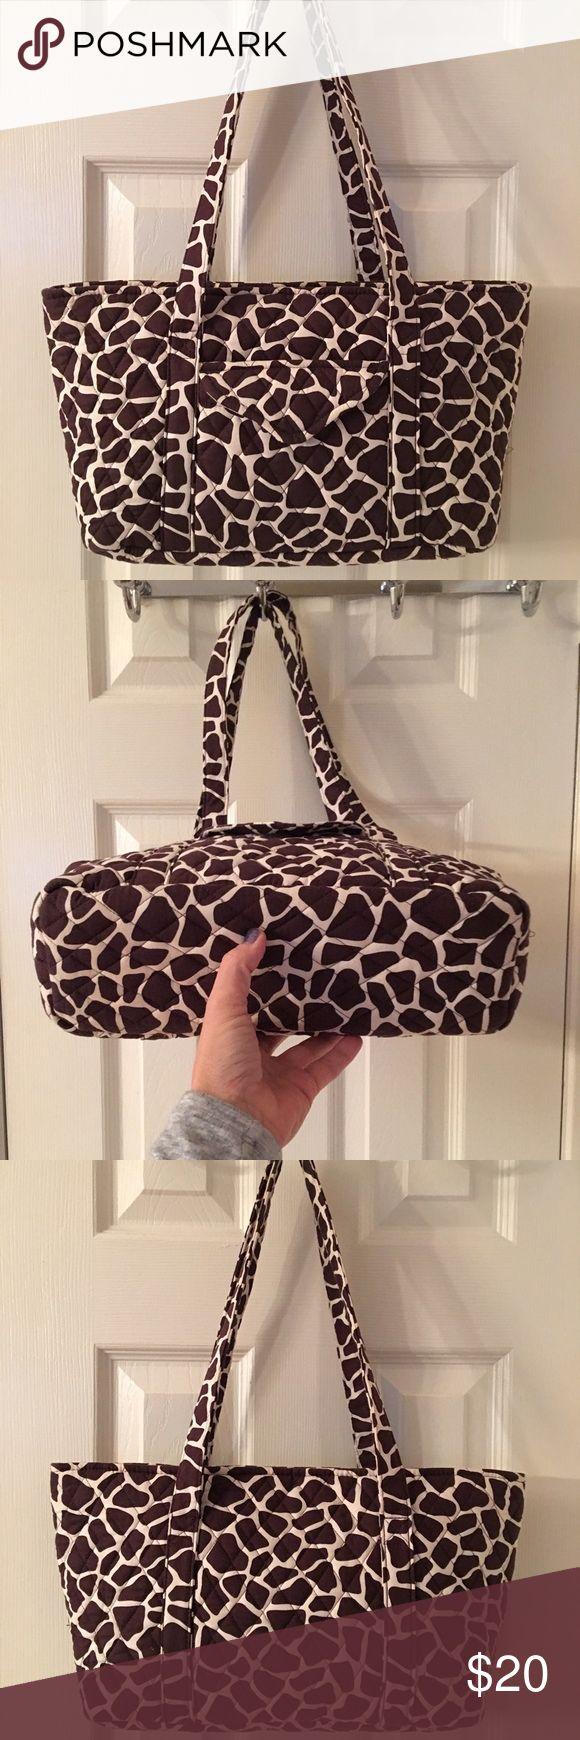 🛍 Kate & Sara Brown Giraffe Print Shoulder Bag Cotton bag.  Zip closure.  Like new.  6 interior pockets.  Exterior Velcro pocket.  Key clip.  Measures: 12x3.5x8x10.5. Kate&Sara Bags Shoulder Bags